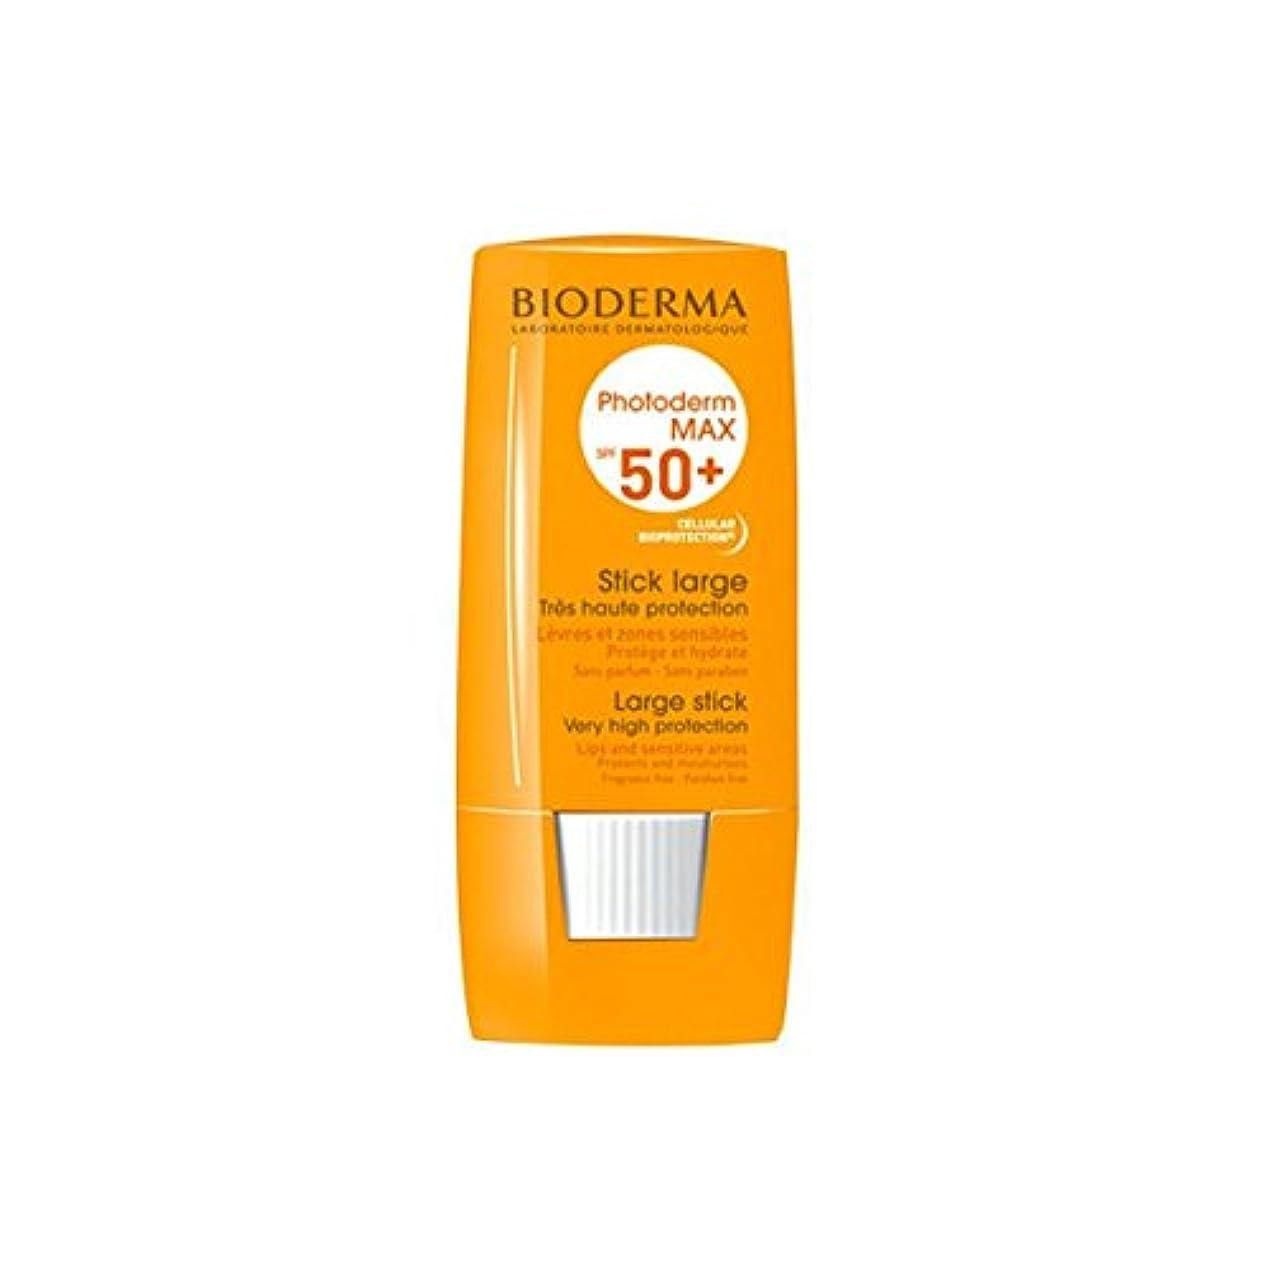 Bioderma Photoderm Max Stick Spf50+ 8gr [並行輸入品]